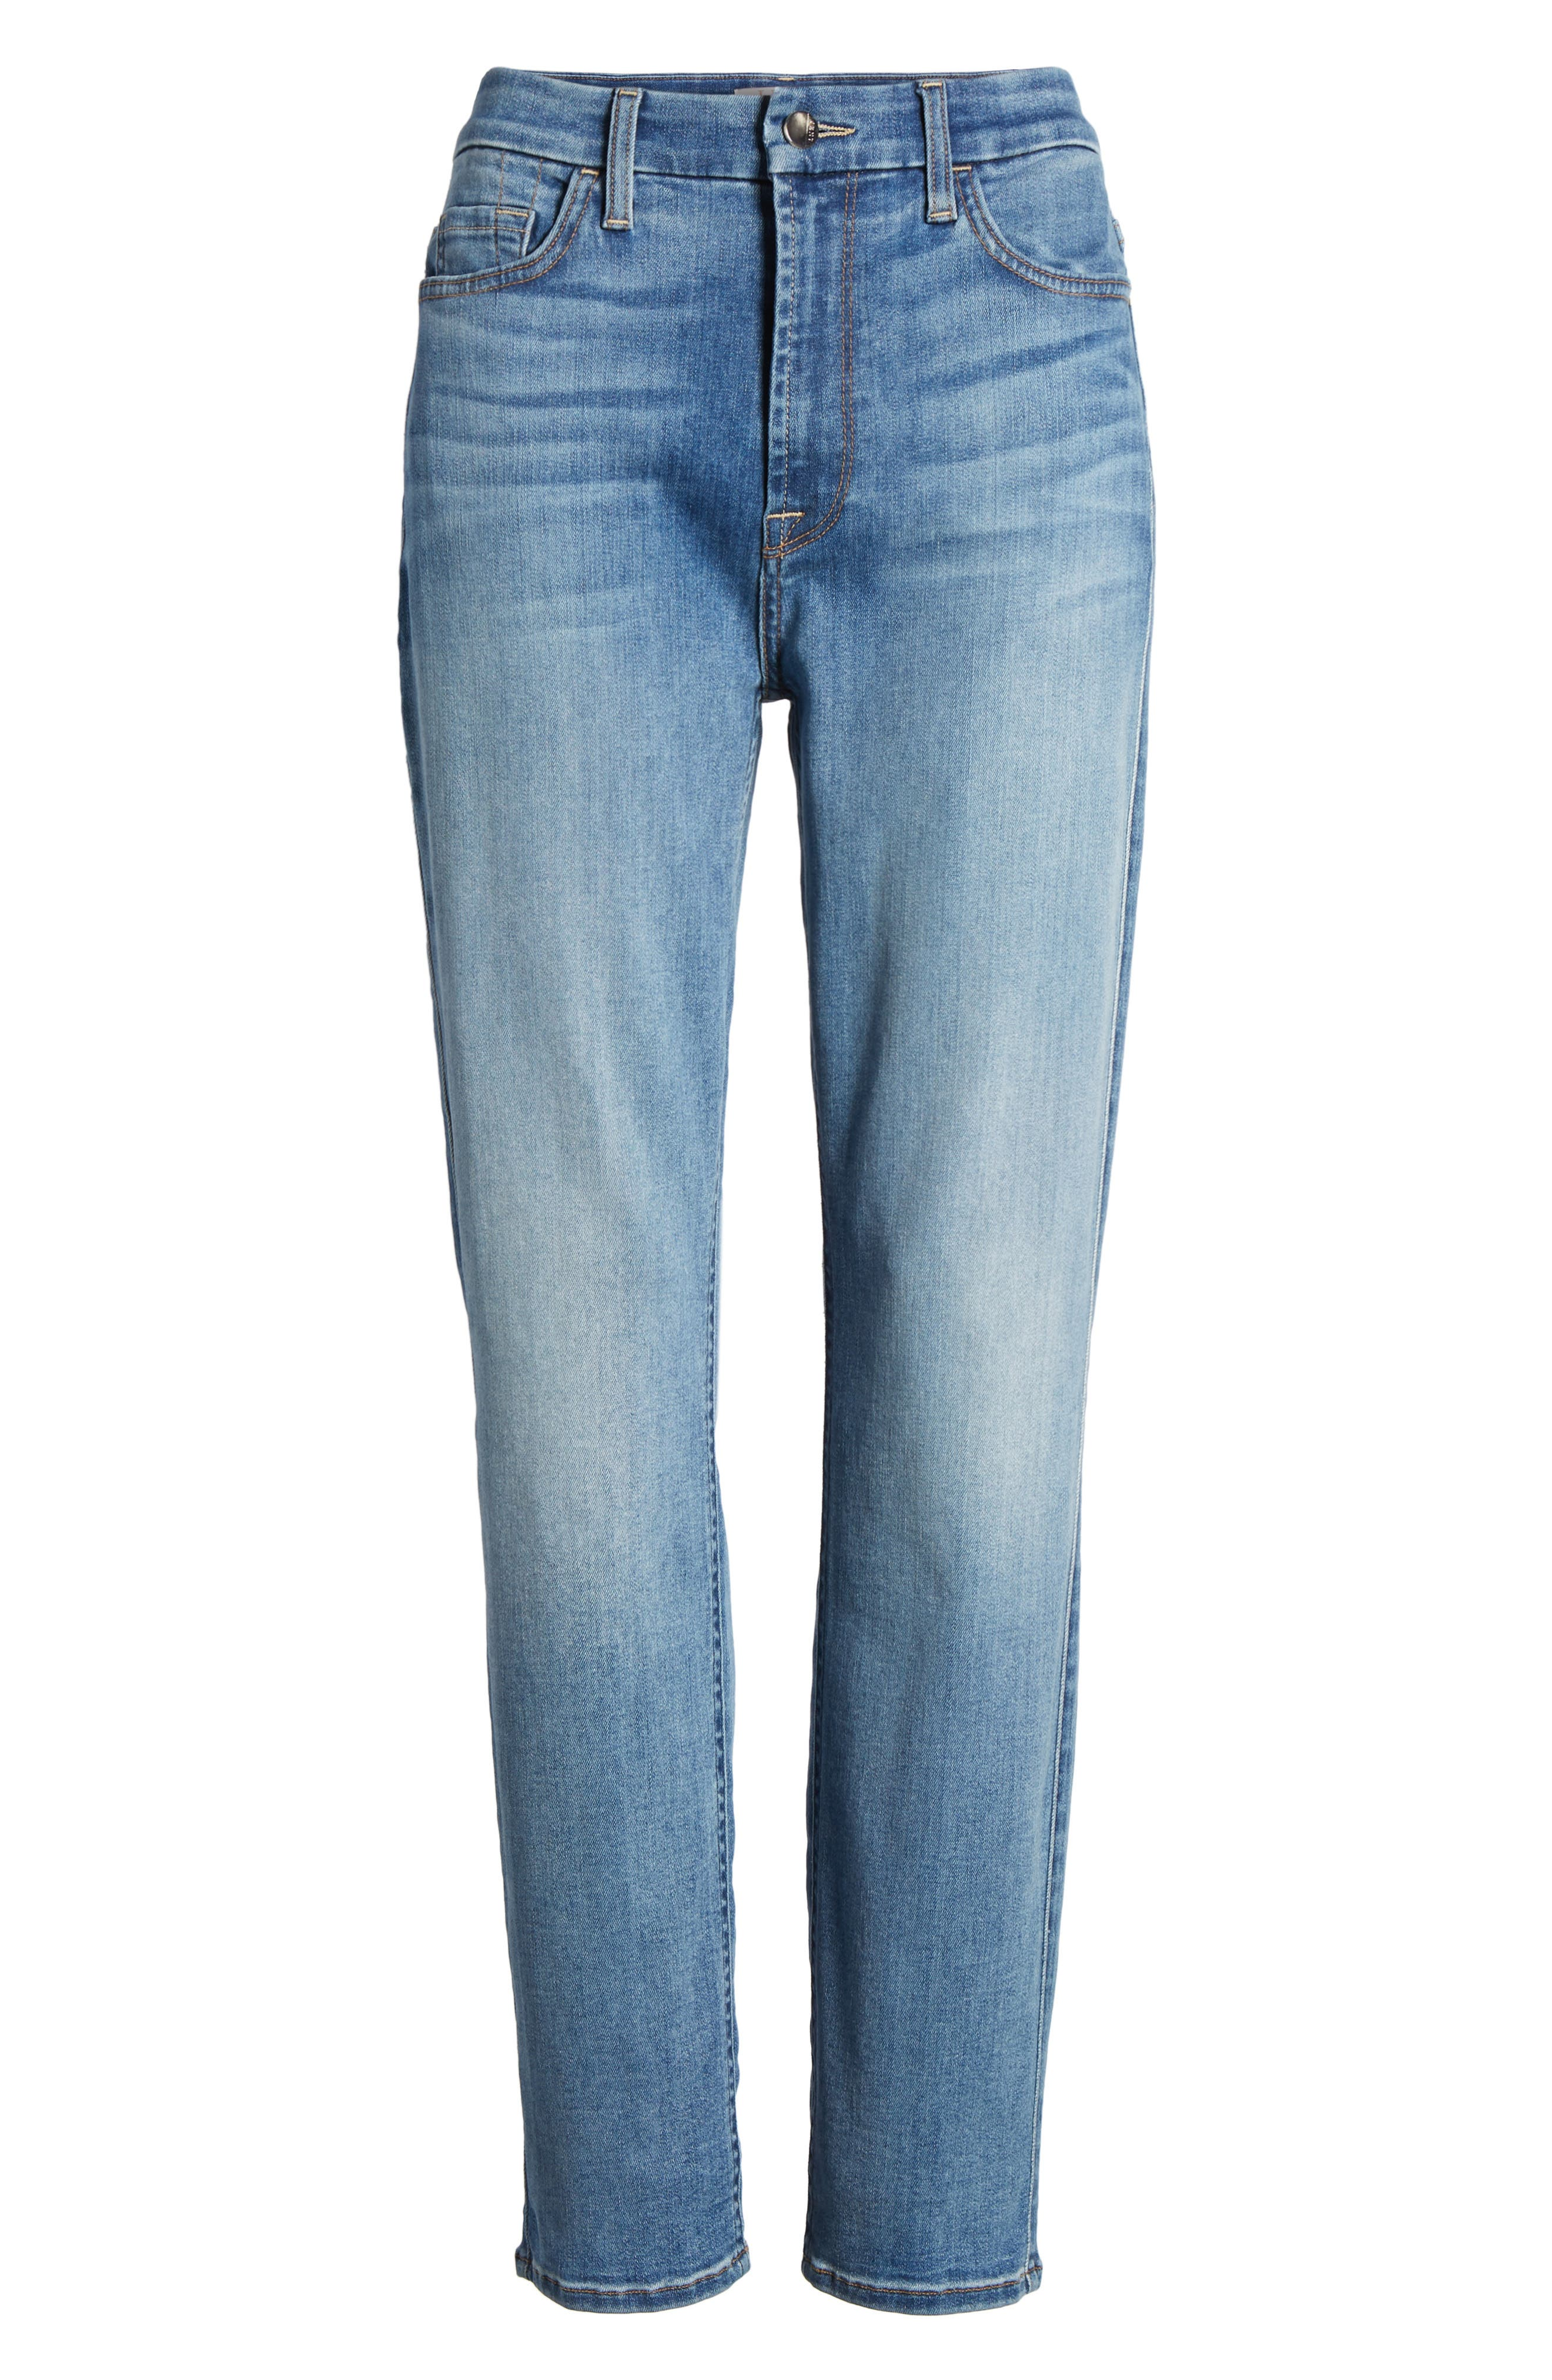 Slim Boyfriend Jeans,                             Alternate thumbnail 7, color,                             SUNLIGHT